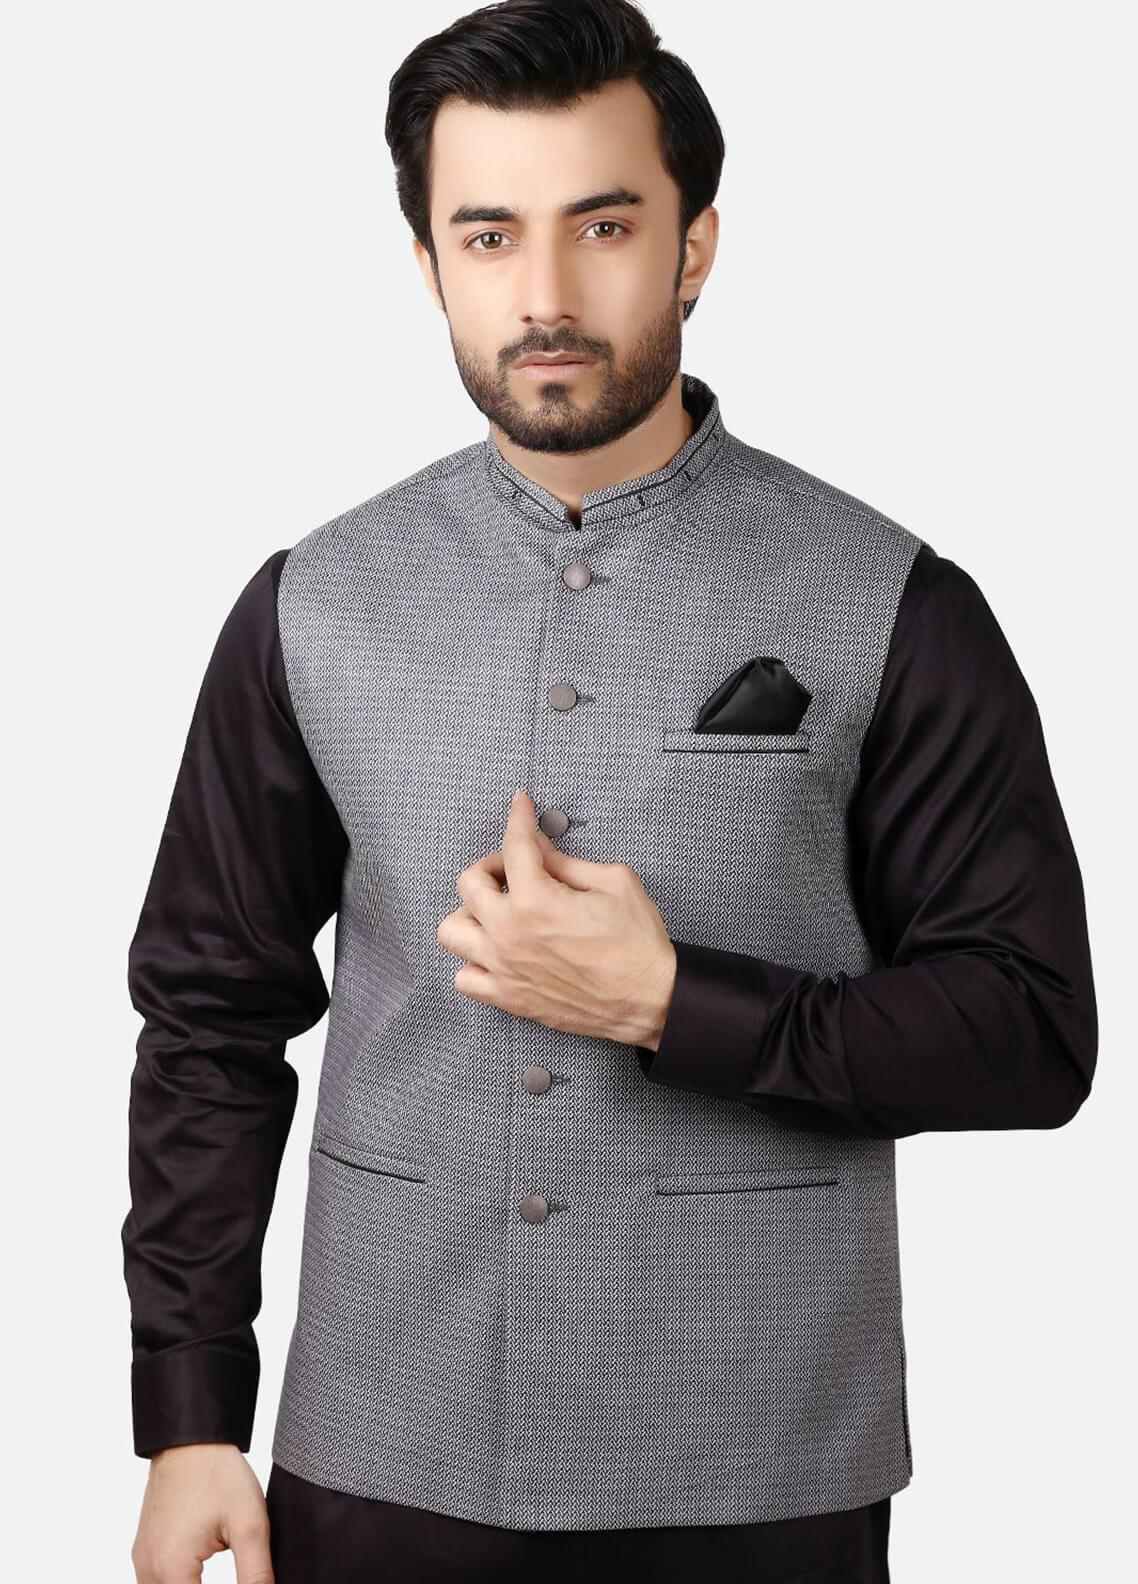 Edenrobe Jacquard Formal Waistcoats for Men - Grey EMTWC19-35675